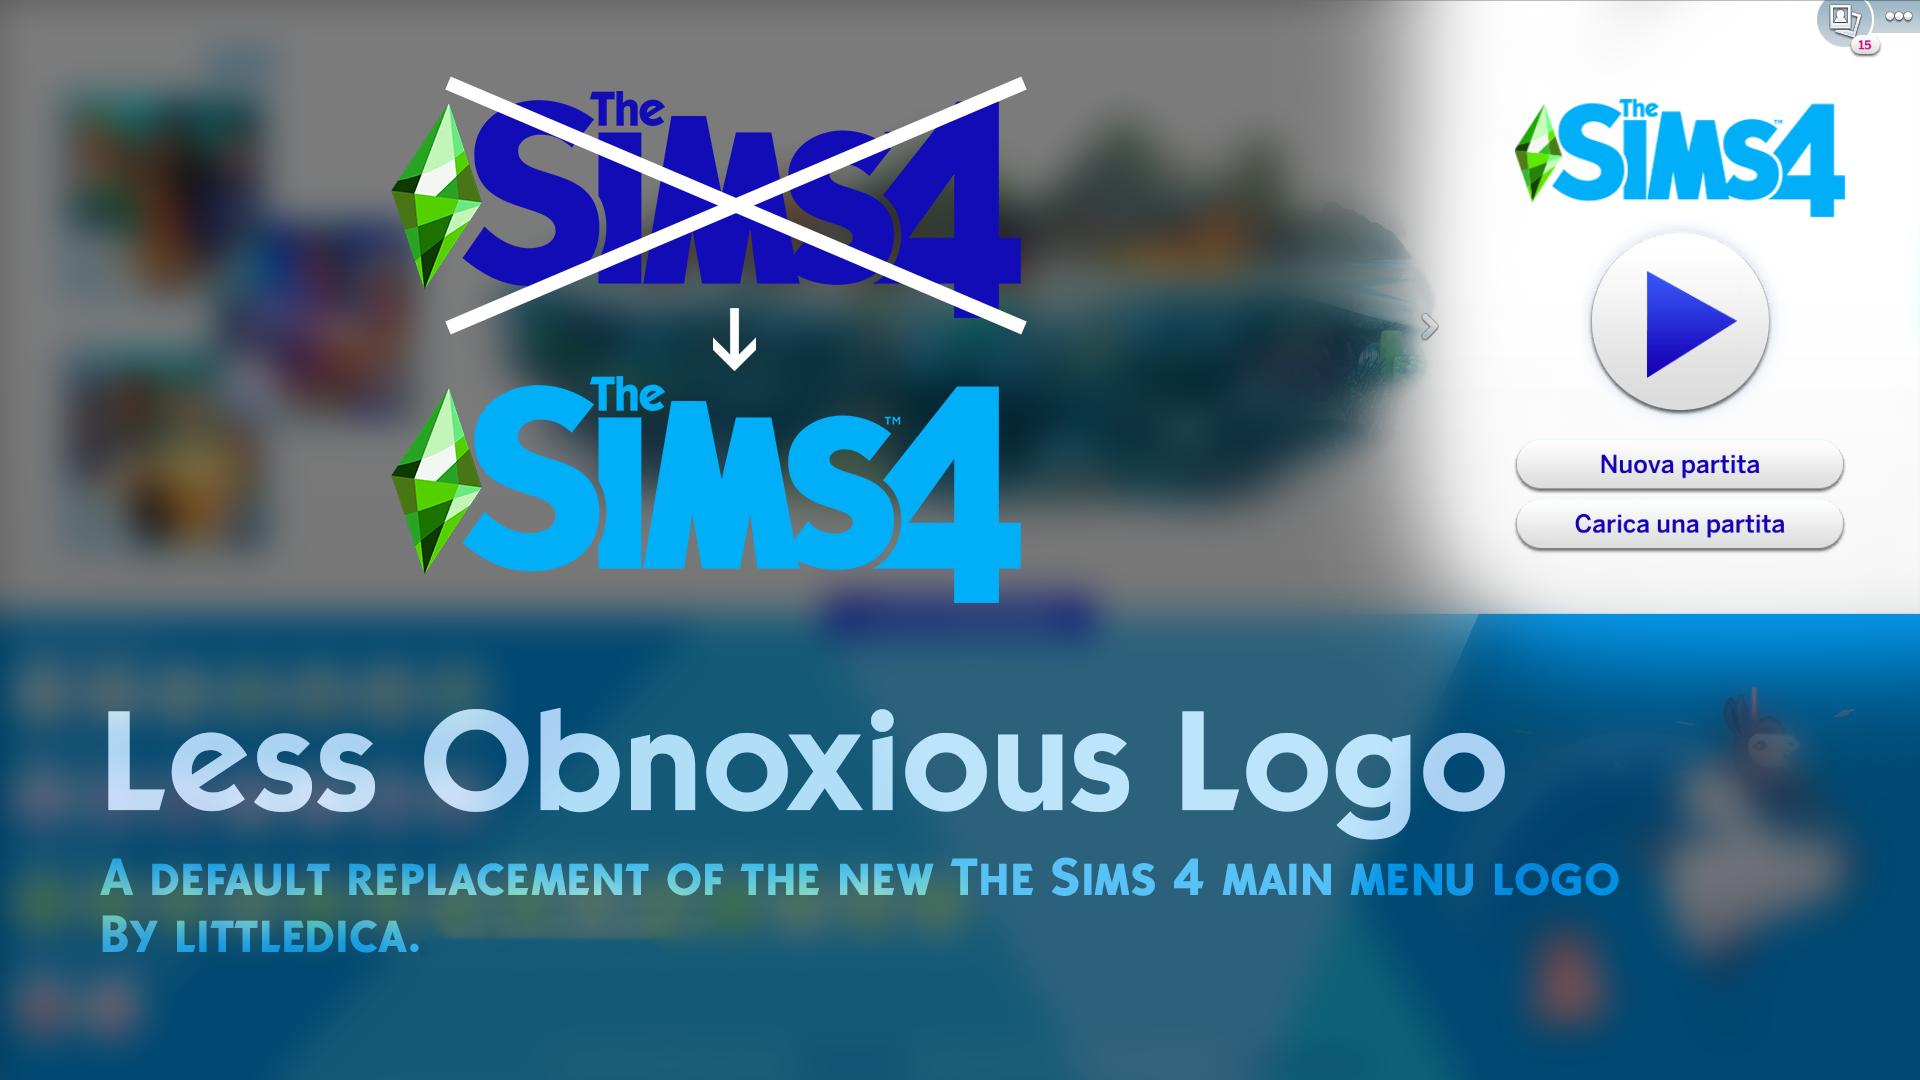 Mod The Sims The Sims 4 Logo Main Menu Override Sims 4 Sims Sims 4 Mods